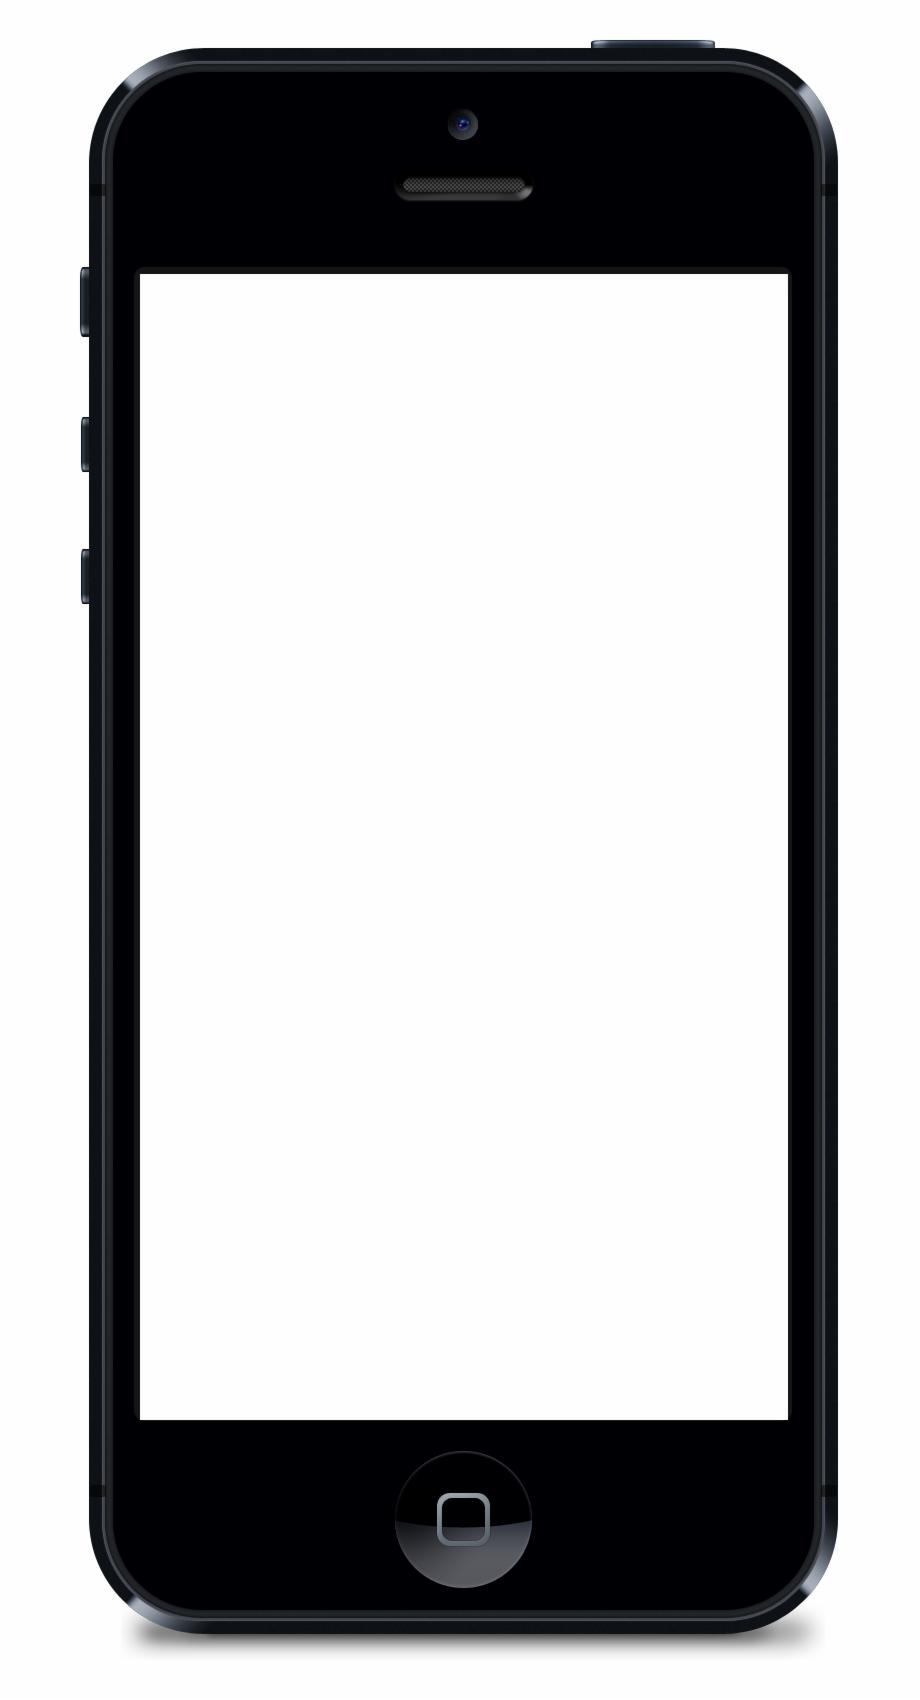 Iphone Pao, Ui Color, Mockup Templates, Iphone 7 Plus,.